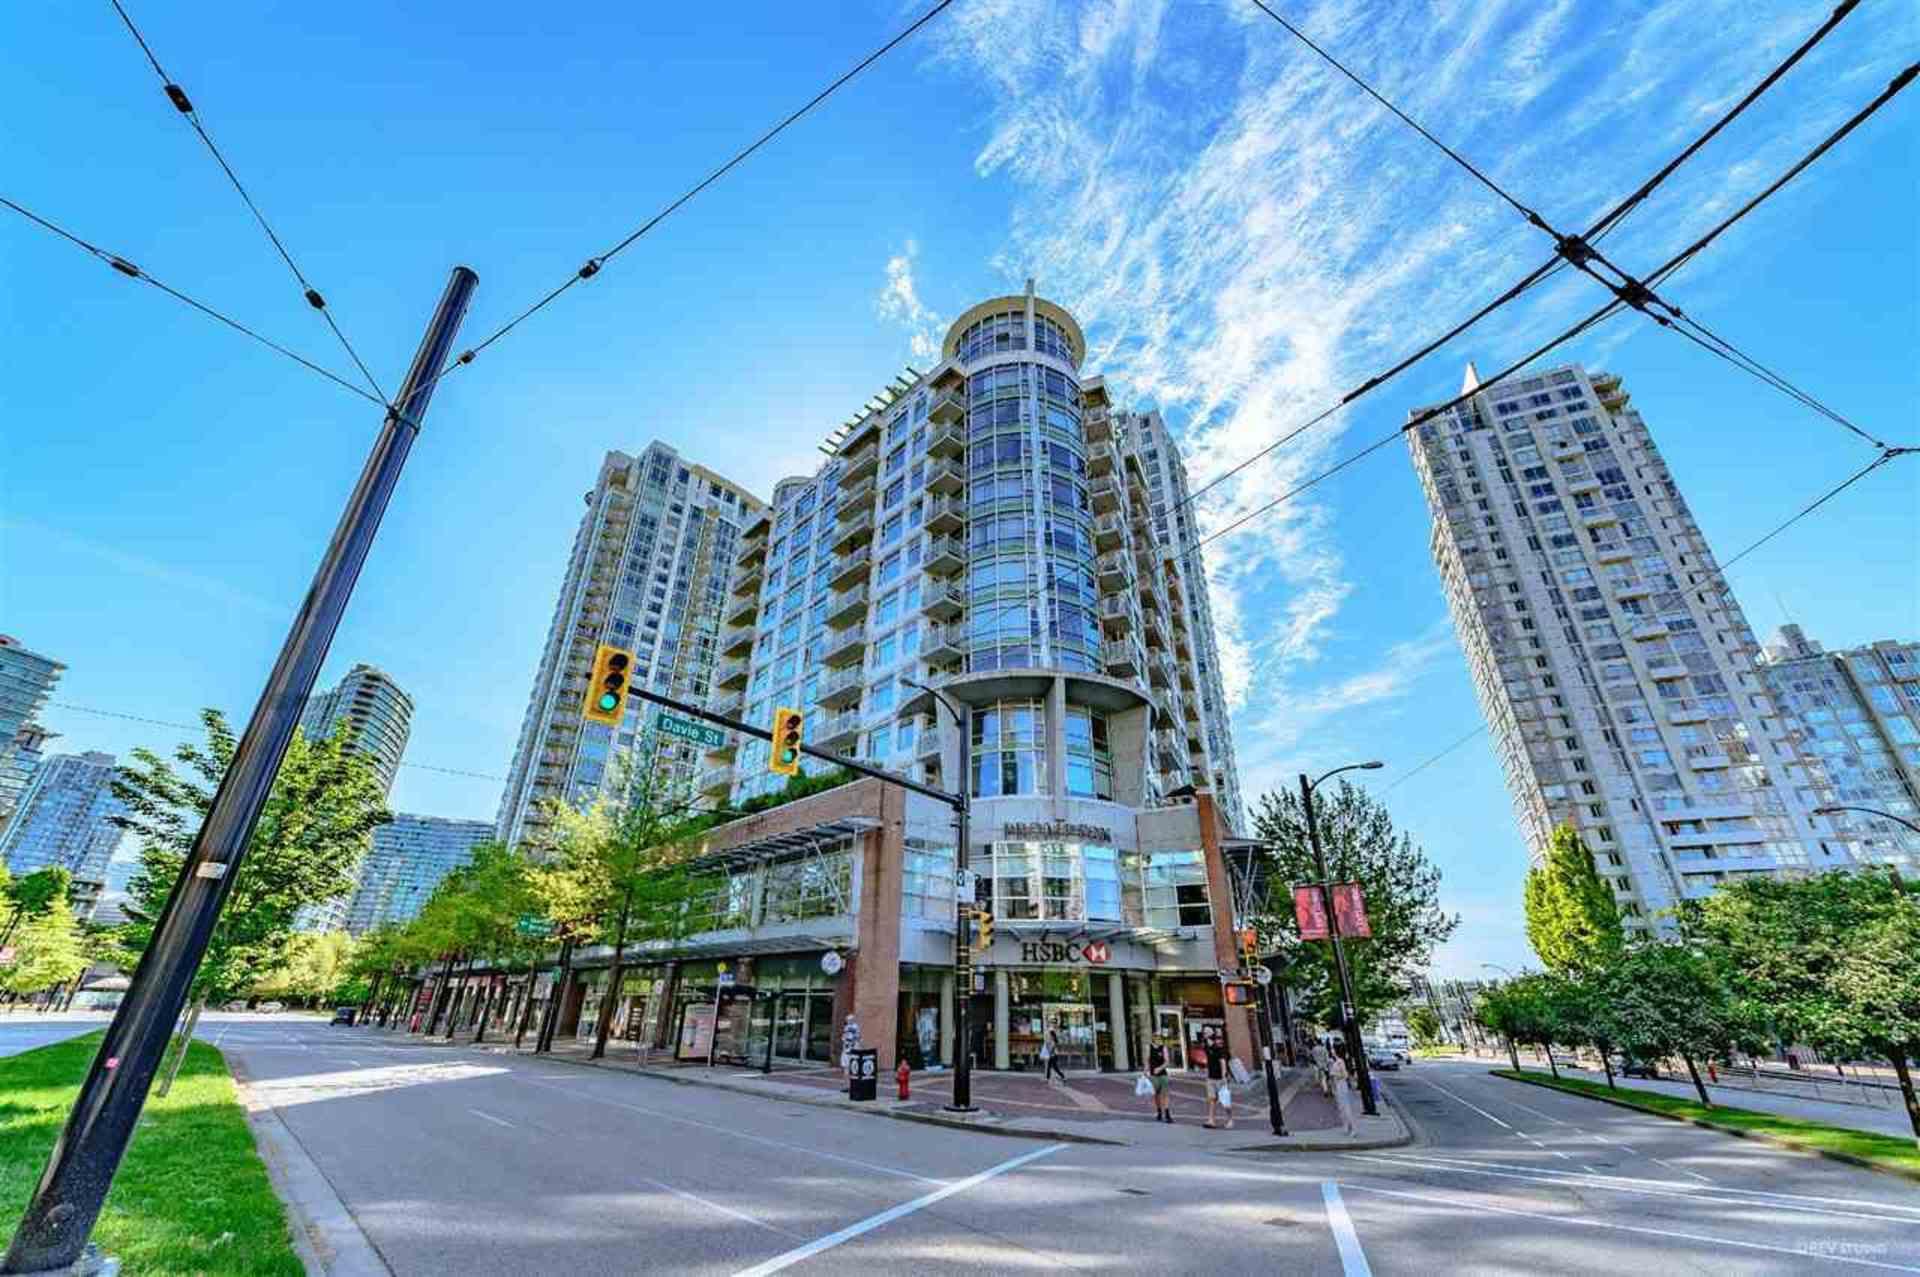 189-davie-street-yaletown-vancouver-west-20 at 1105 - 189 Davie Street, Yaletown, Vancouver West